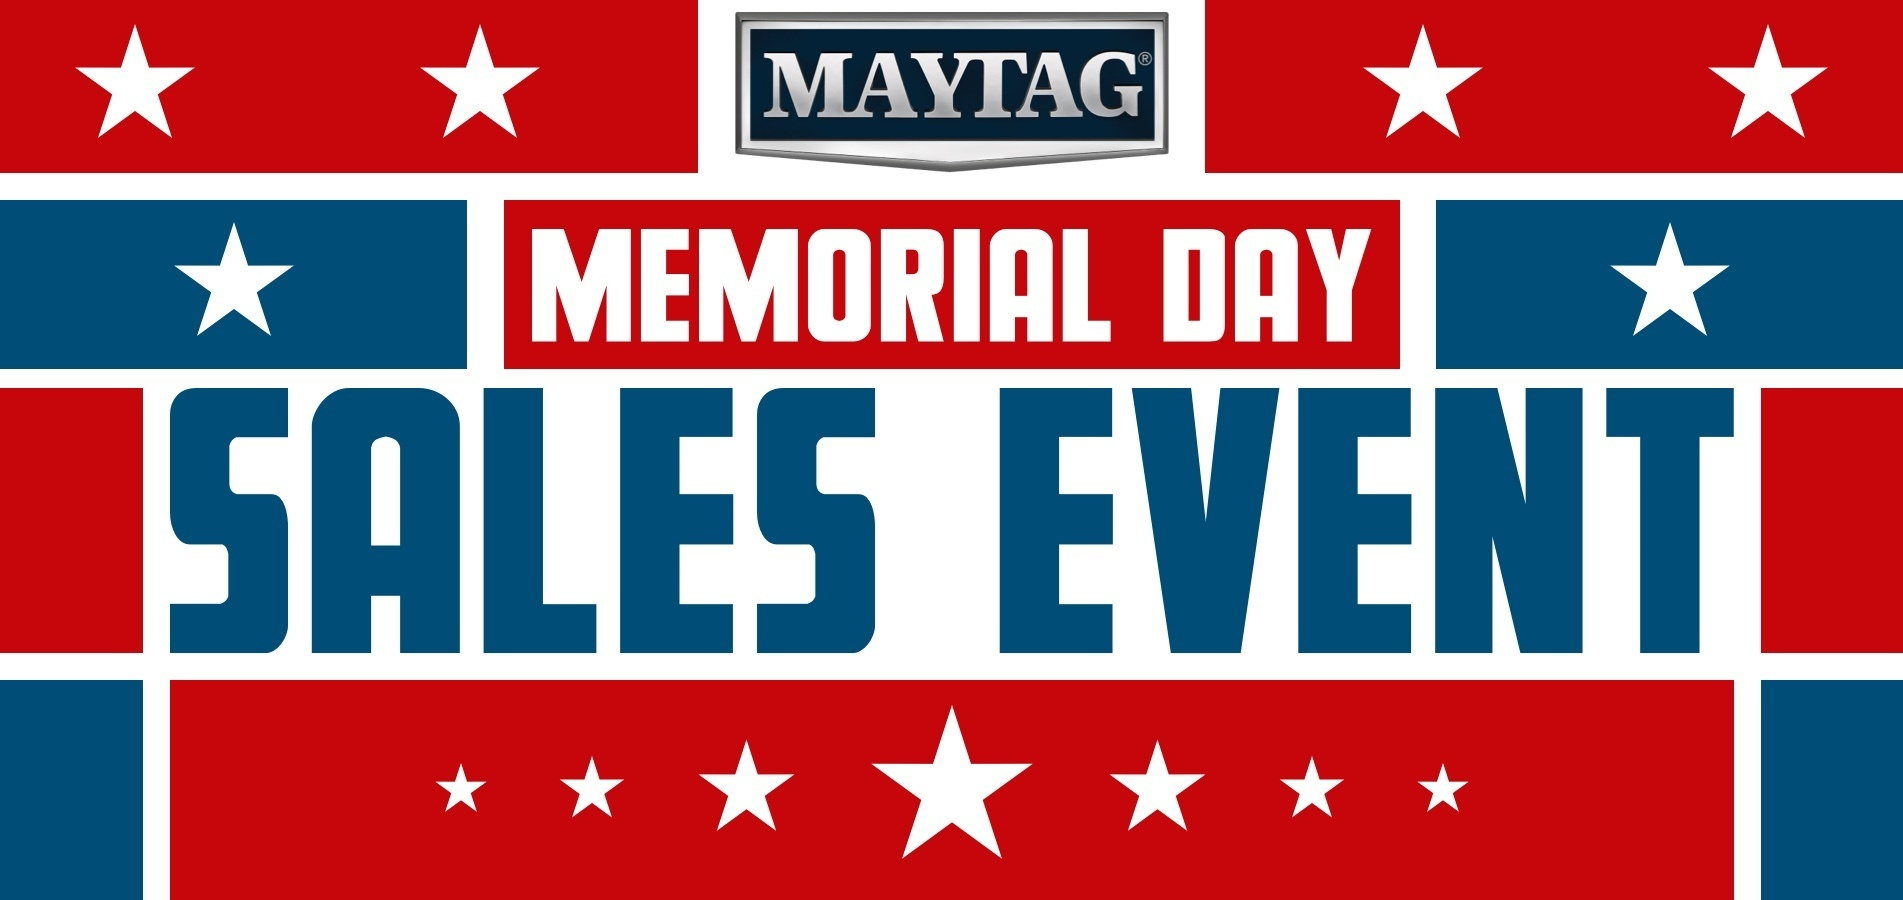 Maytag Memorial Day 2021